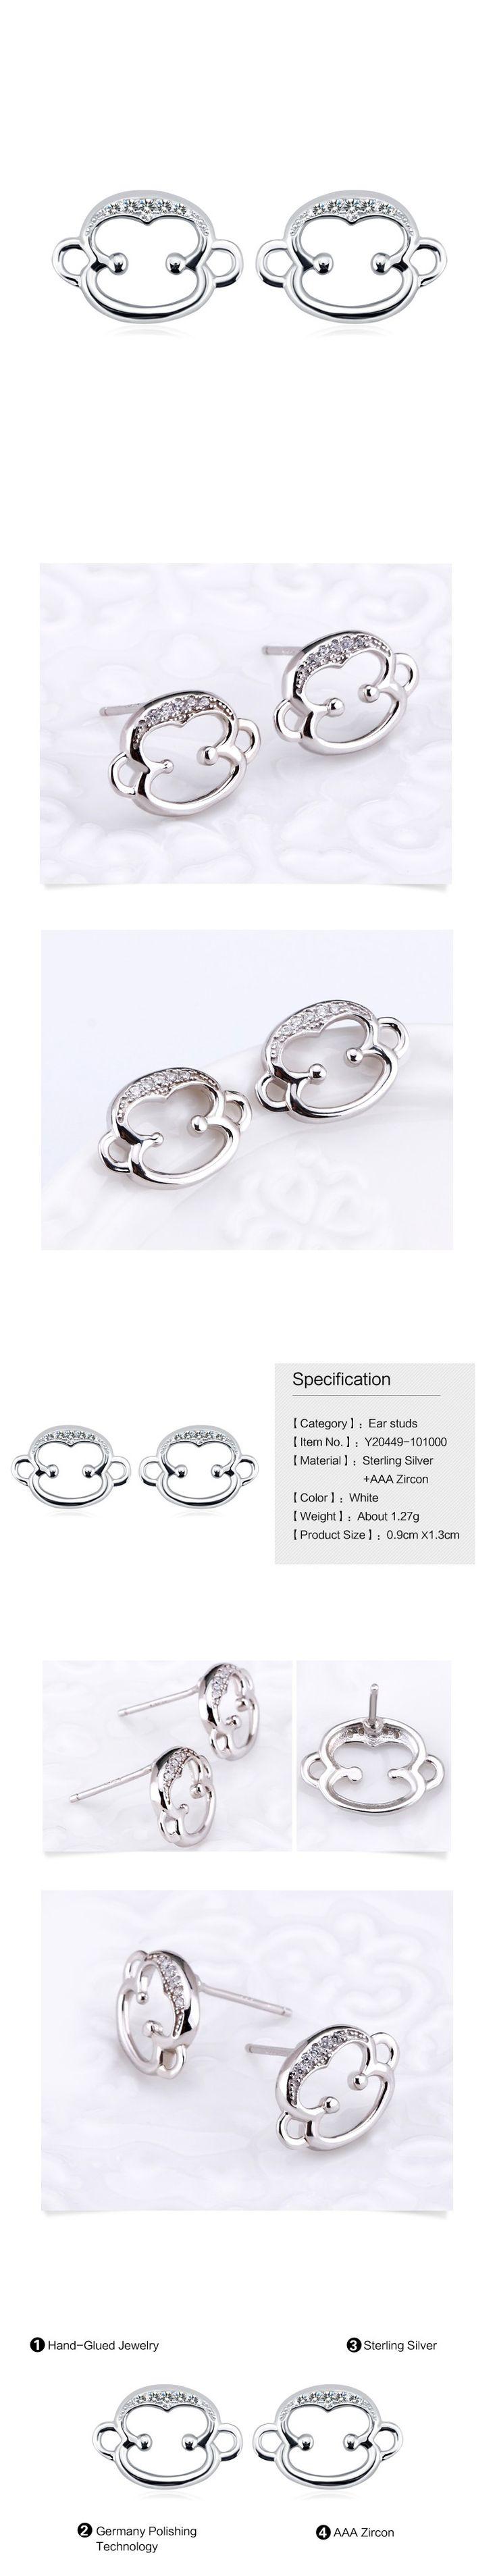 Majom alakú fülbevaló 925 ezüst